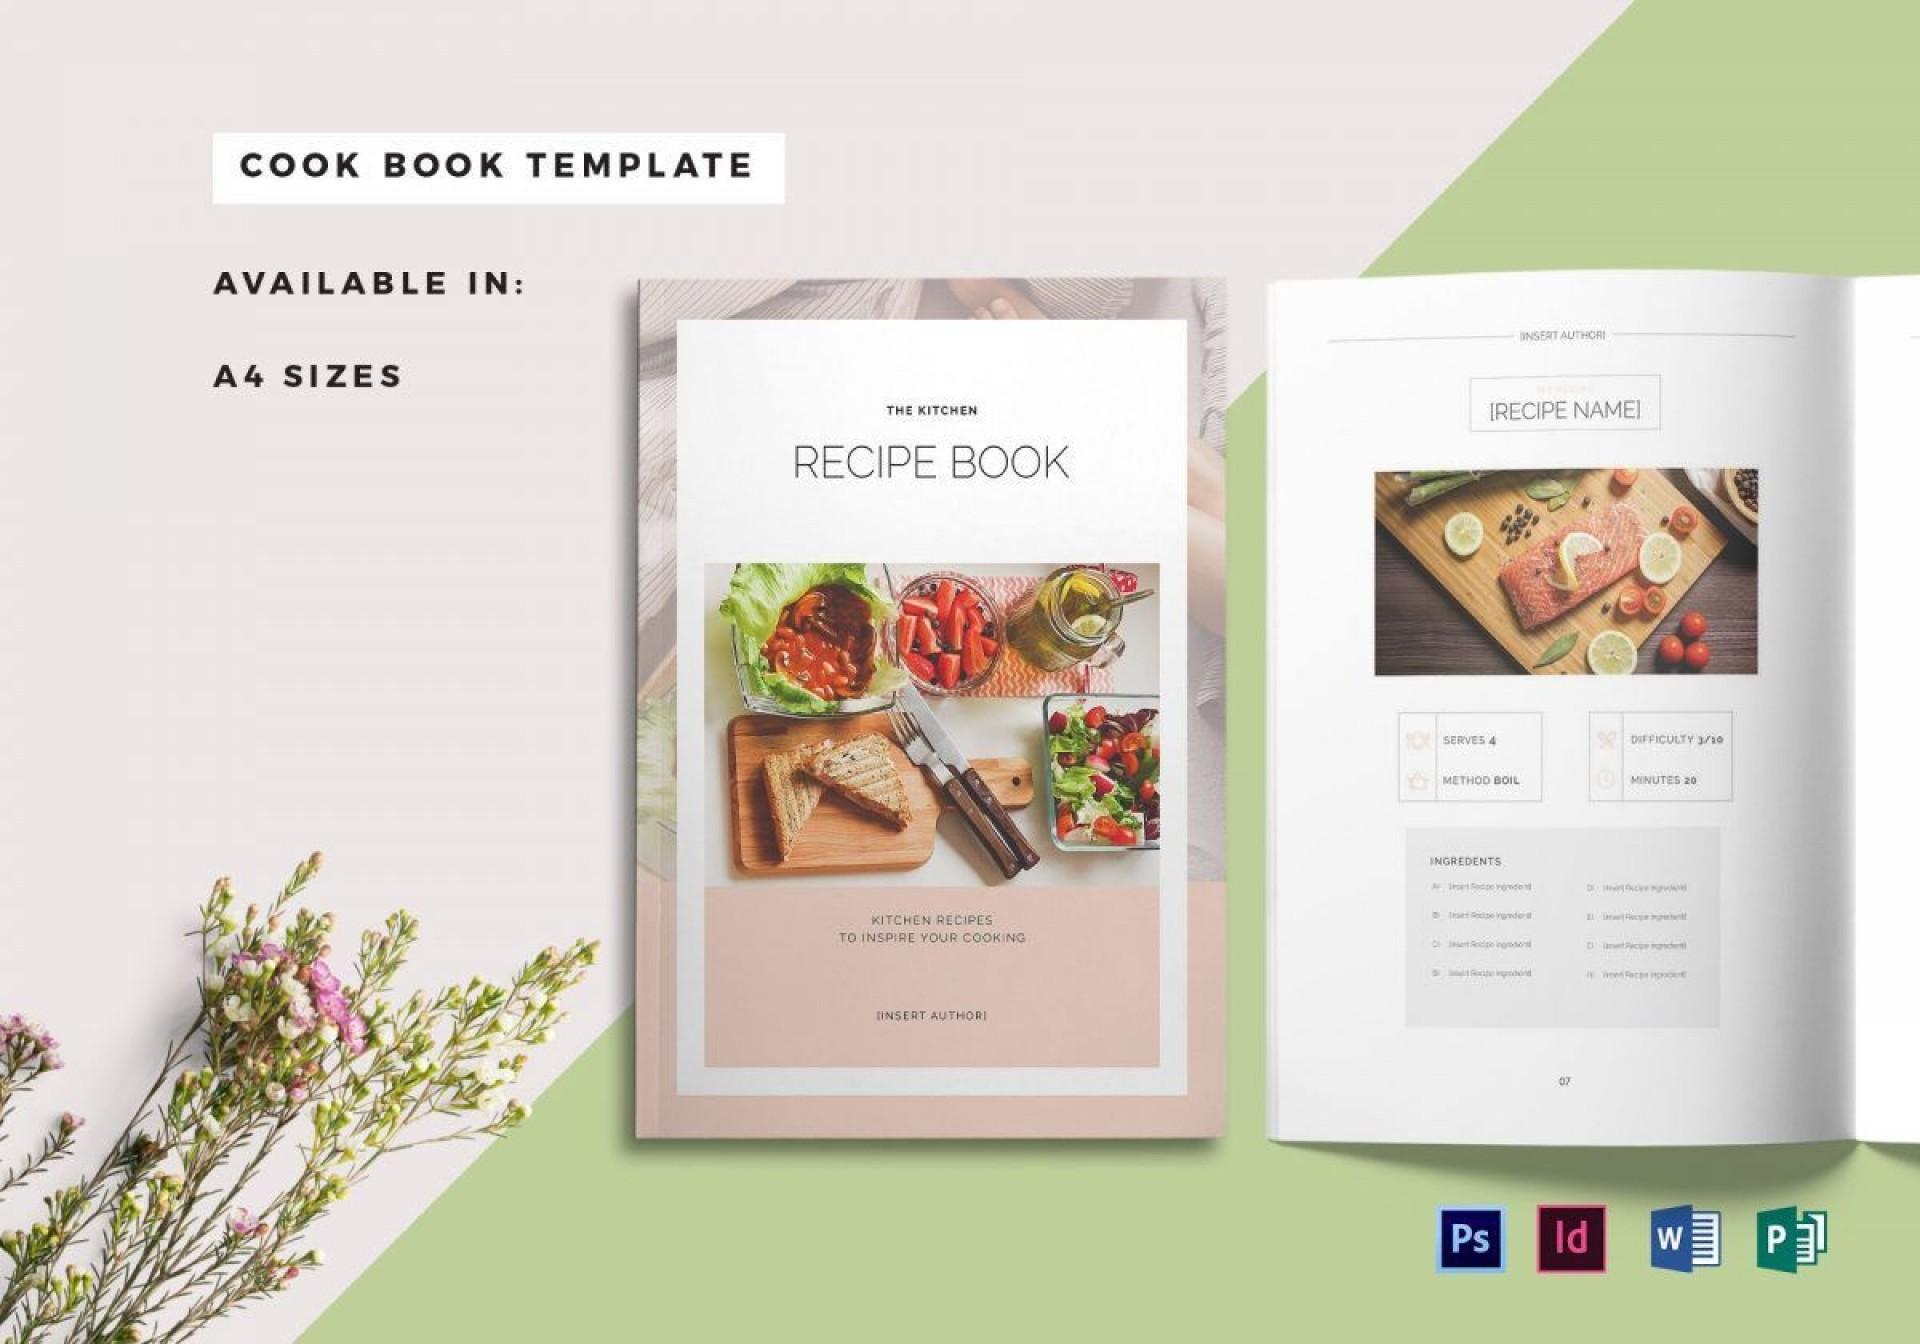 004 Awesome Recipe Book Template Word High Resolution  Mac Free Microsoft1920